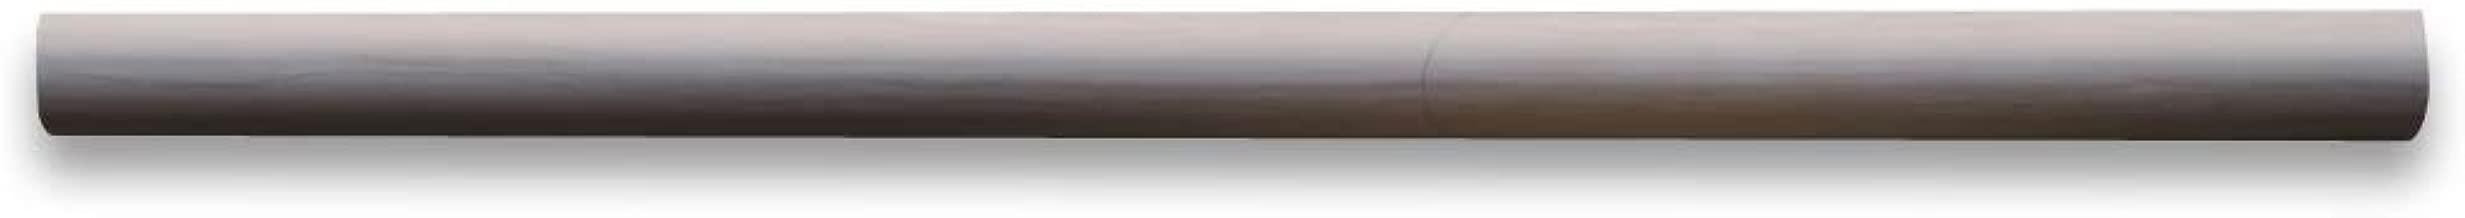 Athens Grey Haisa Dark Wood Grain Marble Pencil Liner Trim Molding 5/8 x 12 Honed